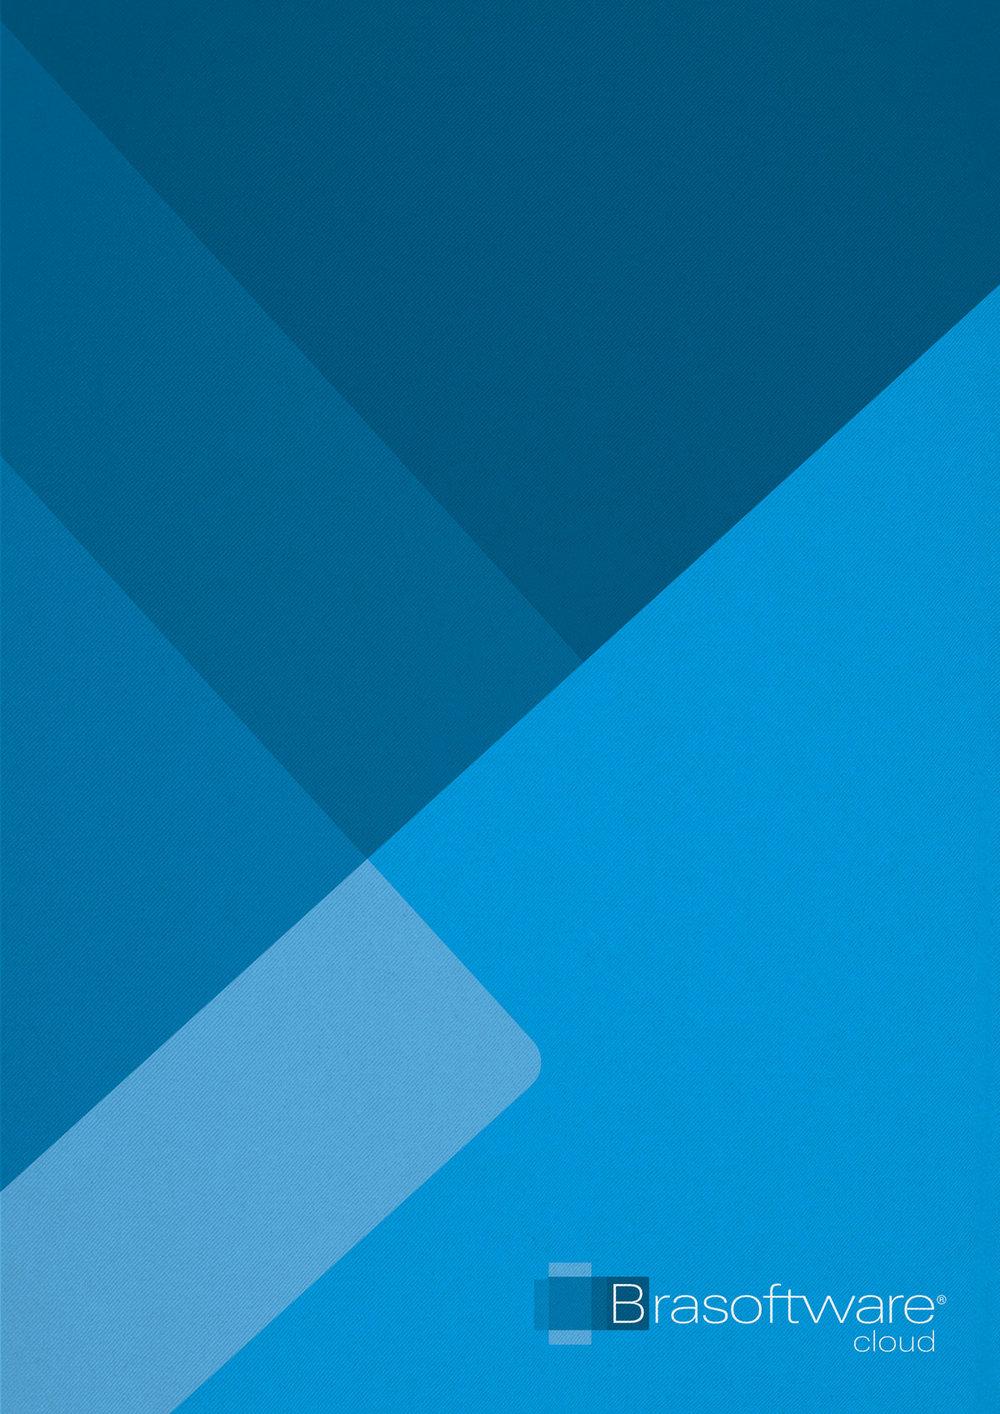 brasoftware-poster-3.jpg